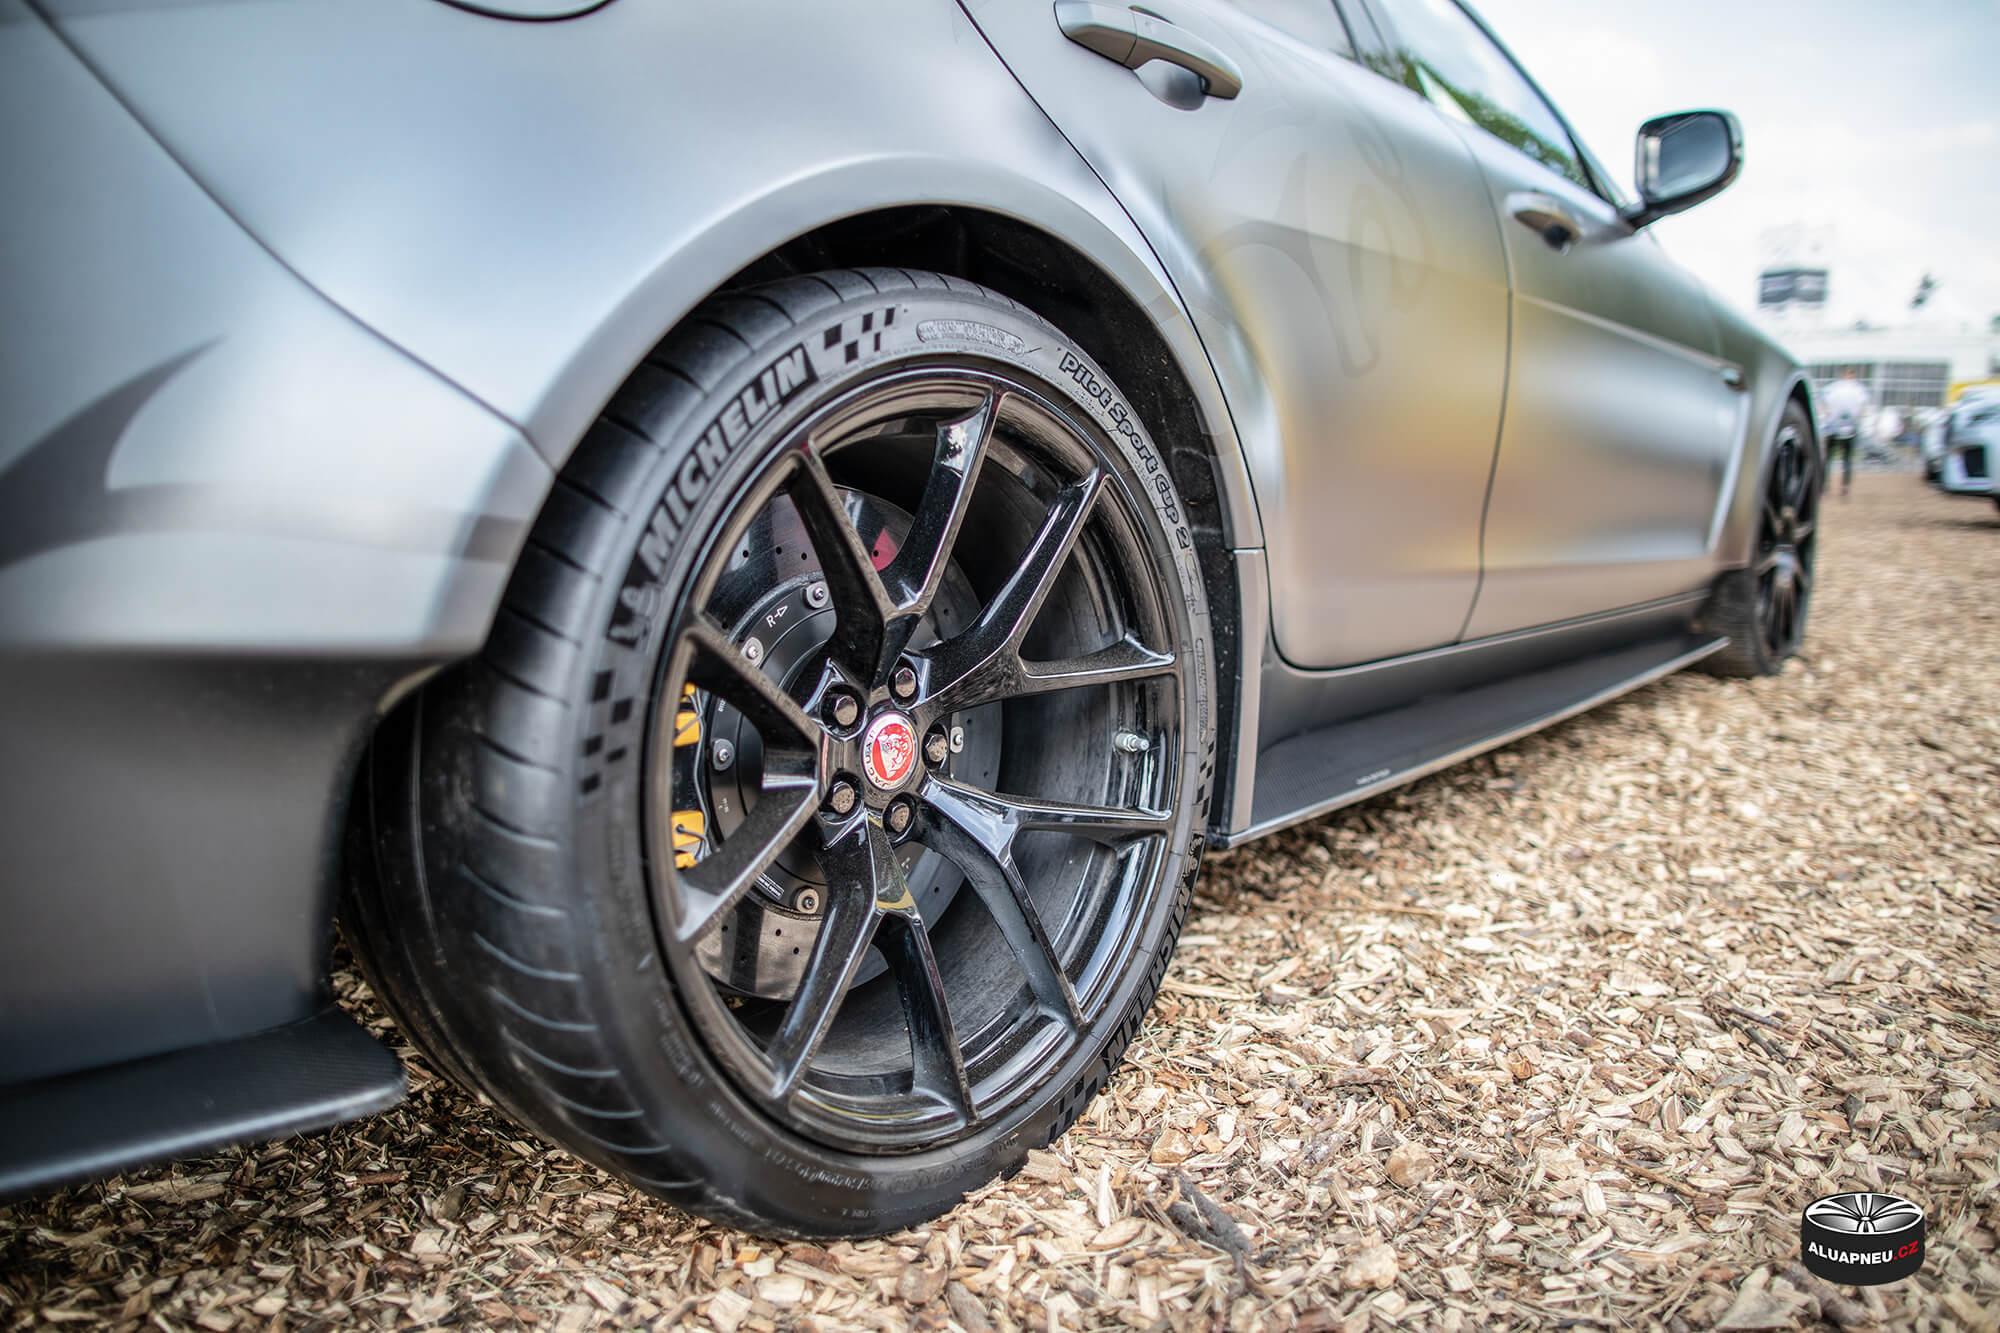 Černá alu kola Jaguar sport - pneu Michelin - Automobilové Legendy 2019 - www.aluapneu.cz